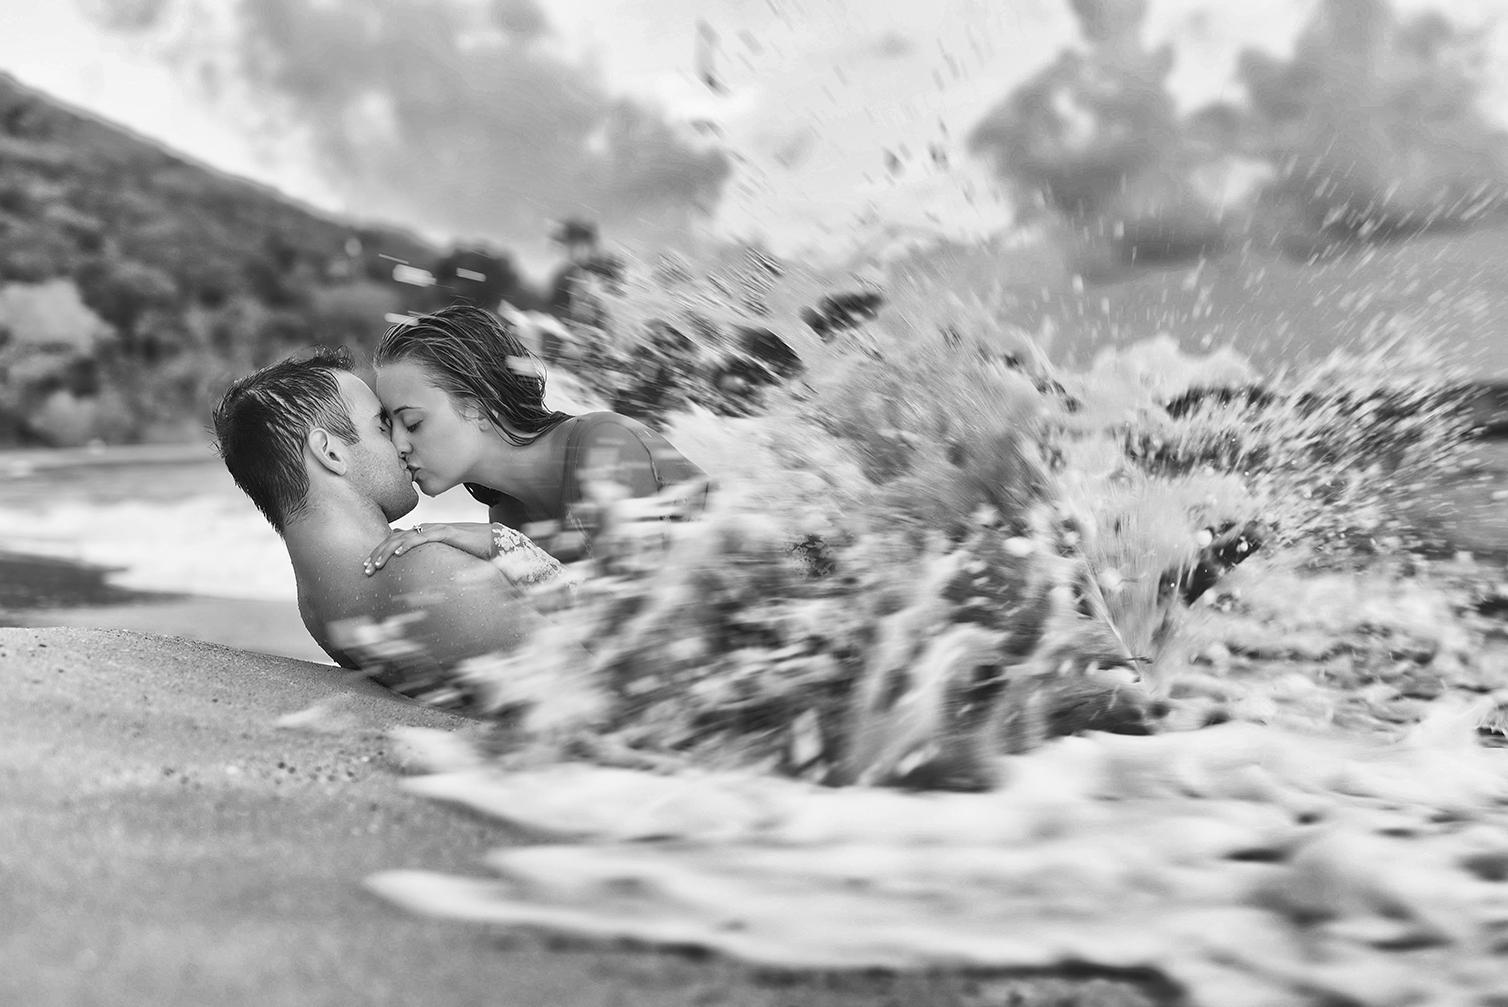 Love for Water002.jpg